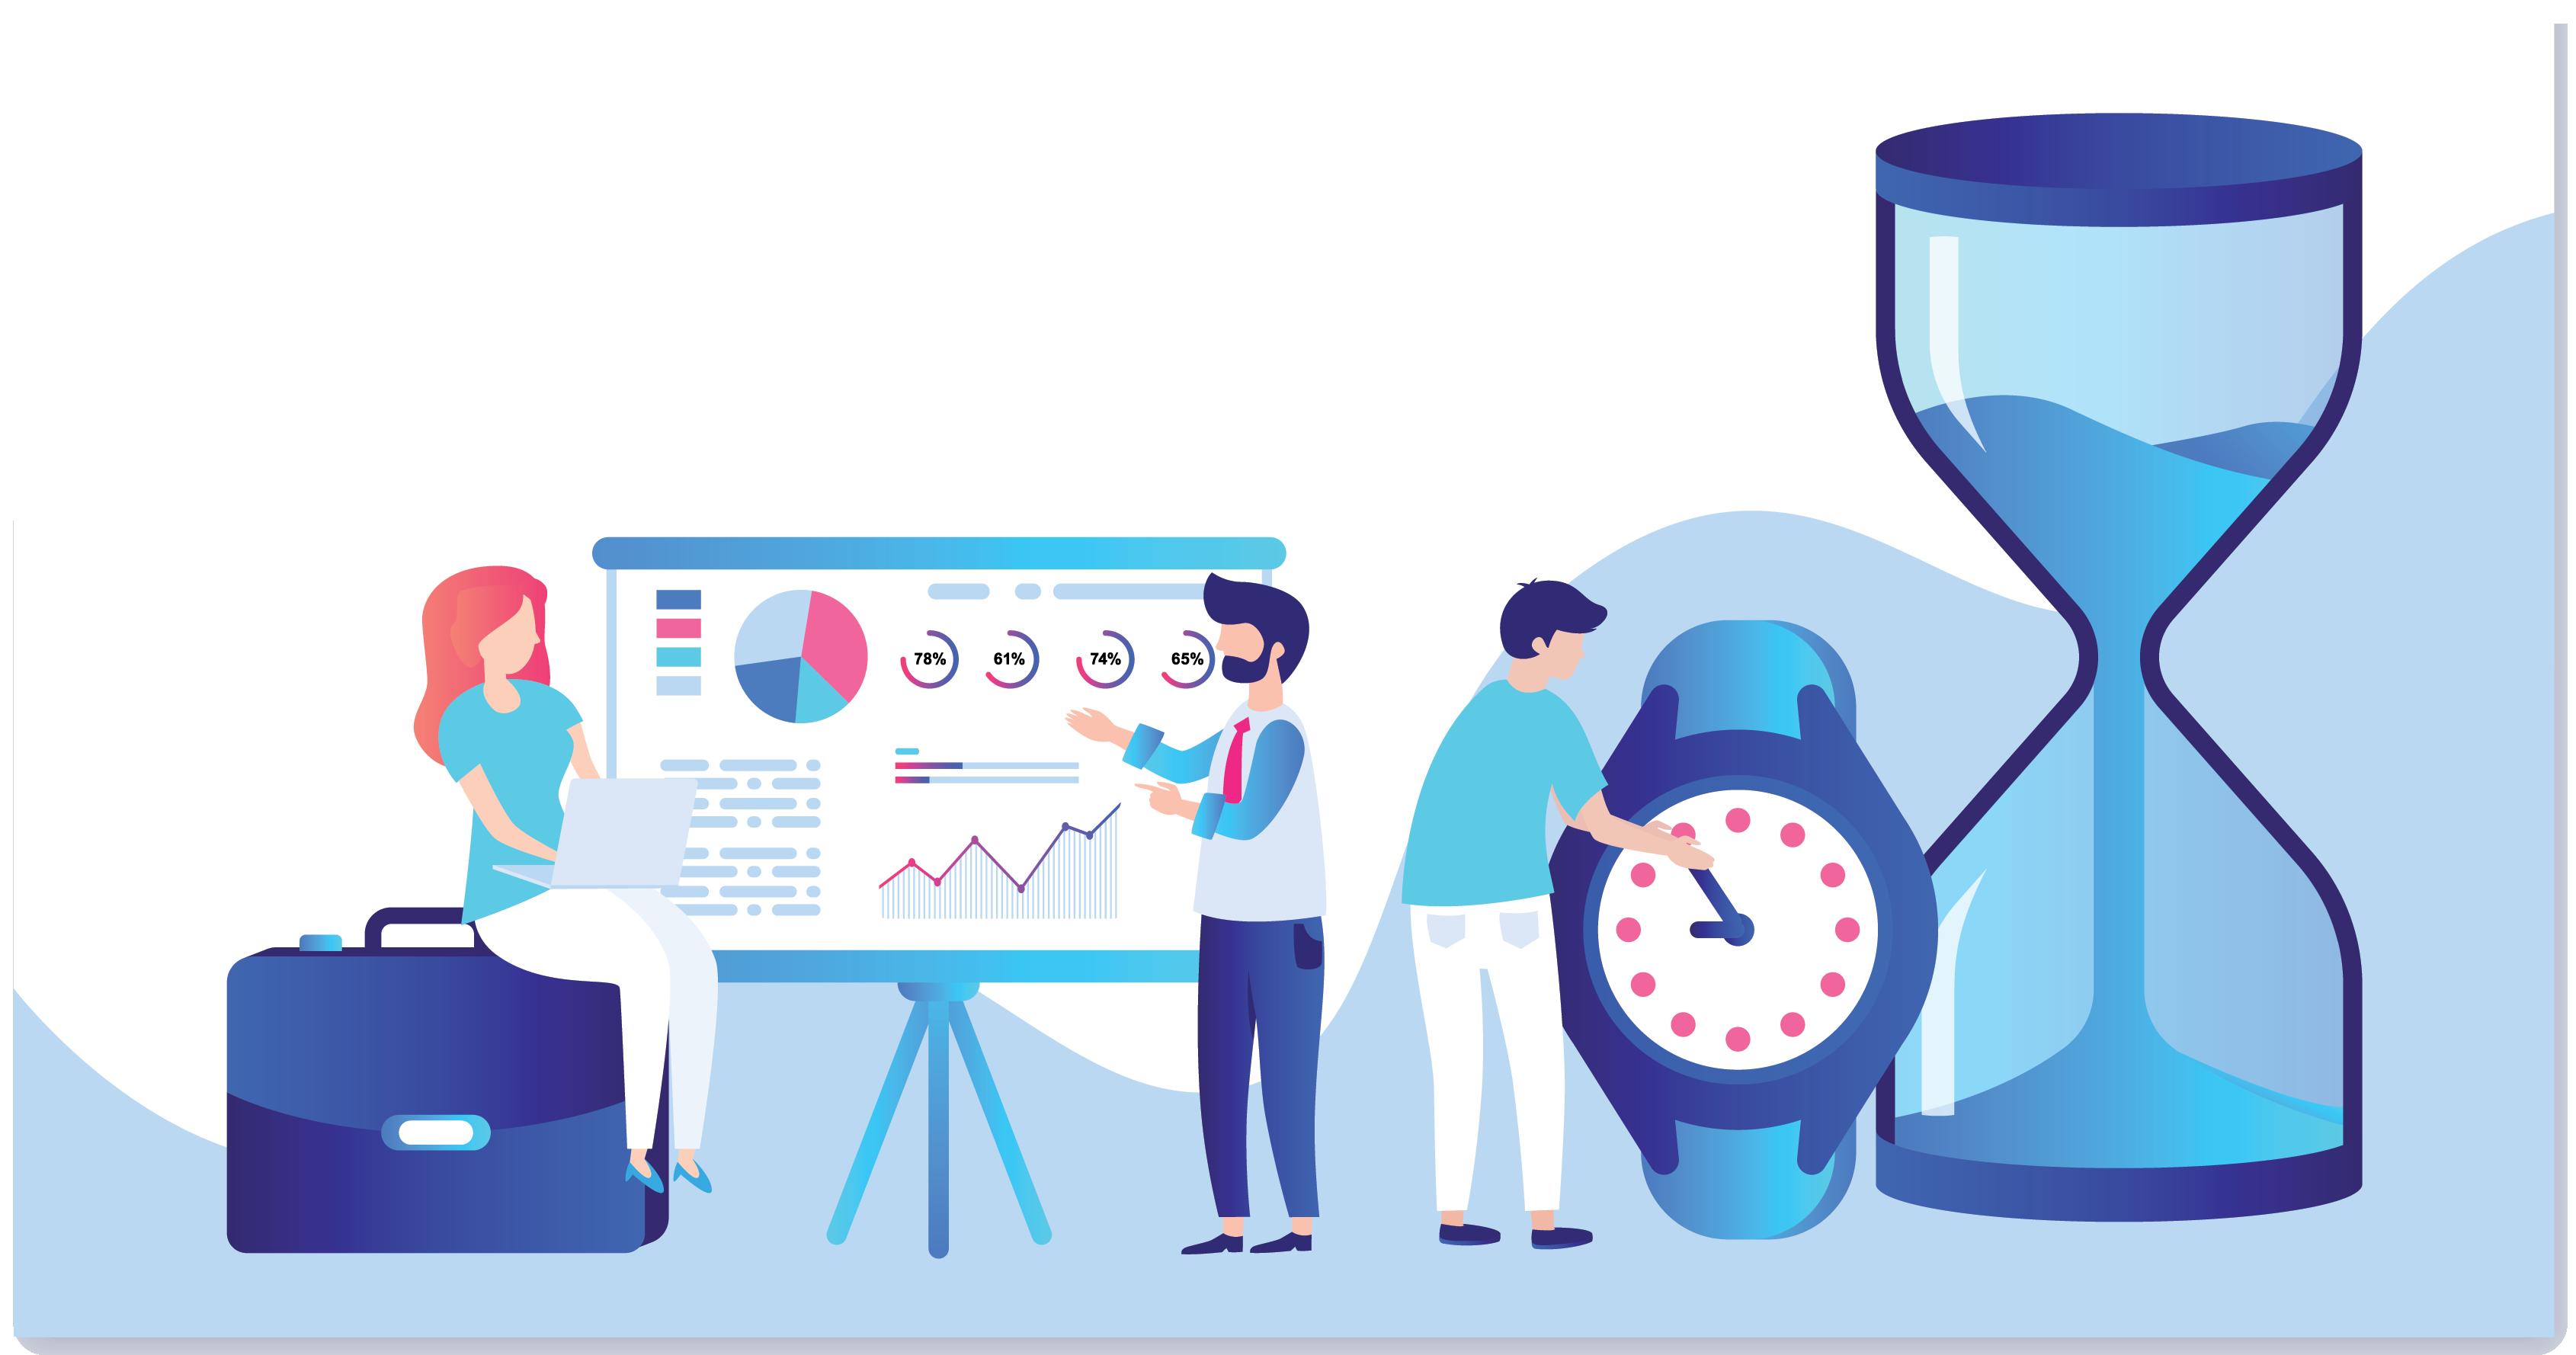 HowHR analyticscan help you retain talent